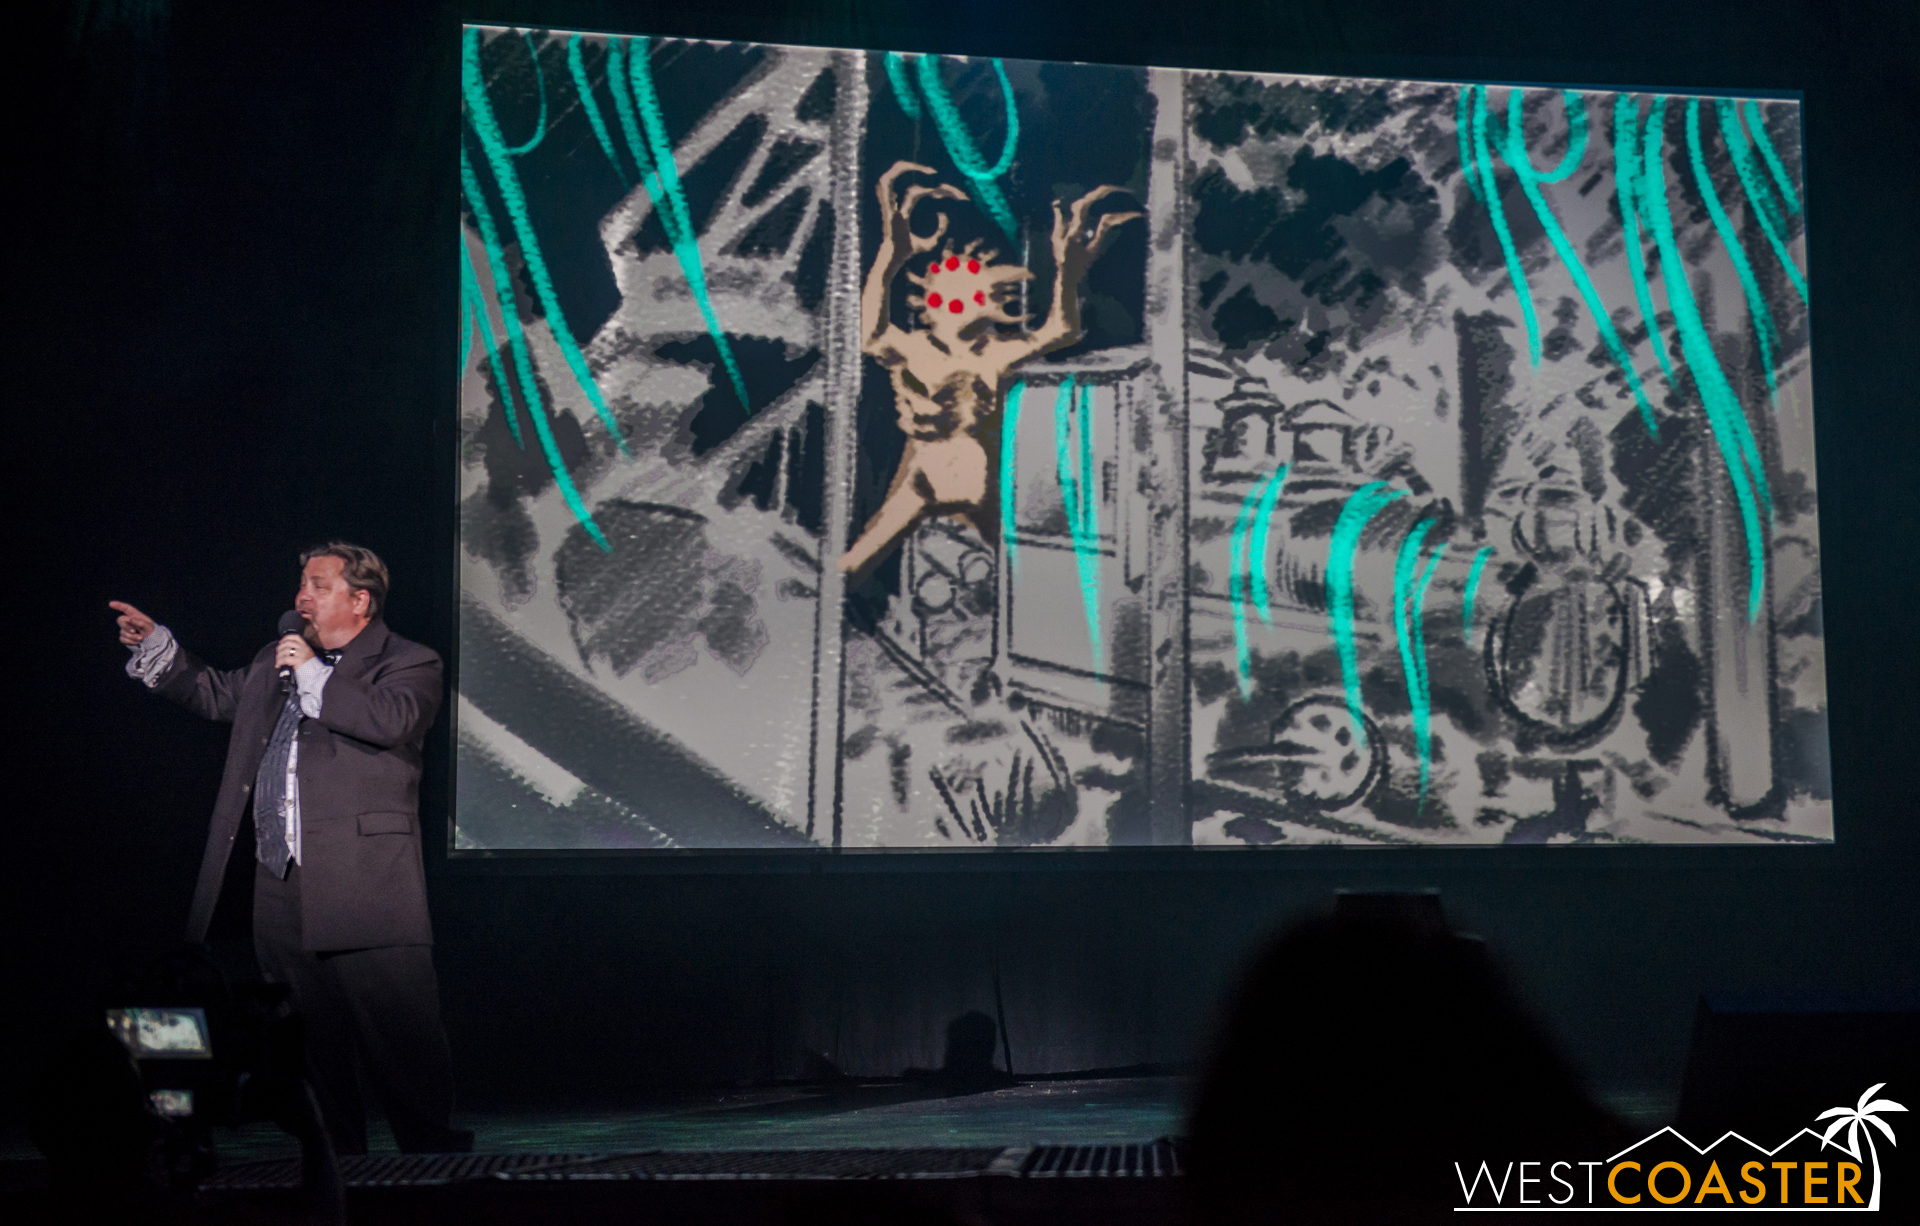 The concept art presented was pretty adorable.